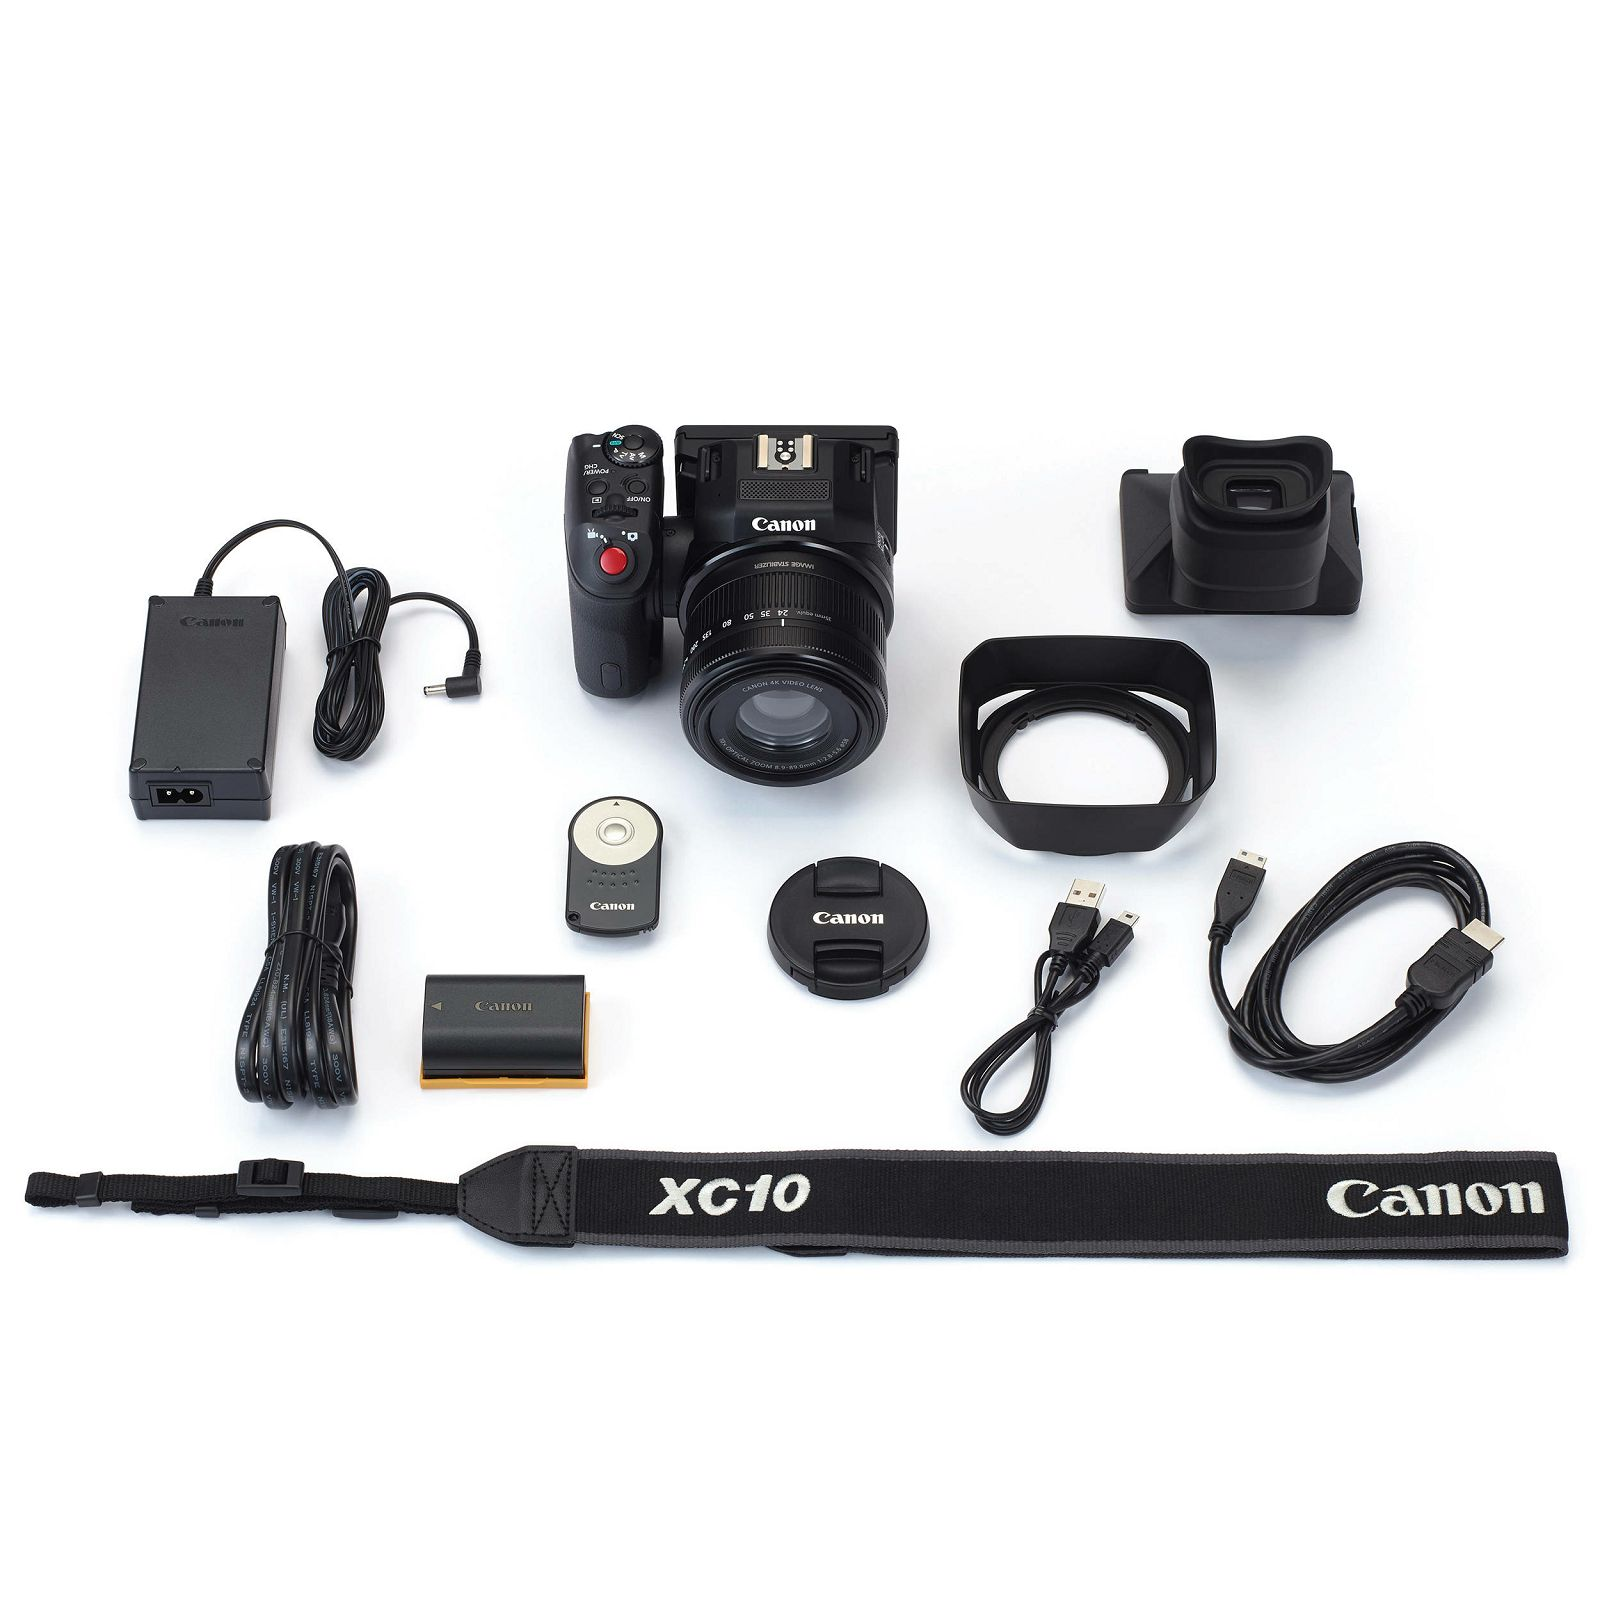 ... Canon XC10 4K WiFi Profesionalna digitalna video kamera kamkorder  Professional Camcorder XC-10 (0565C003AA